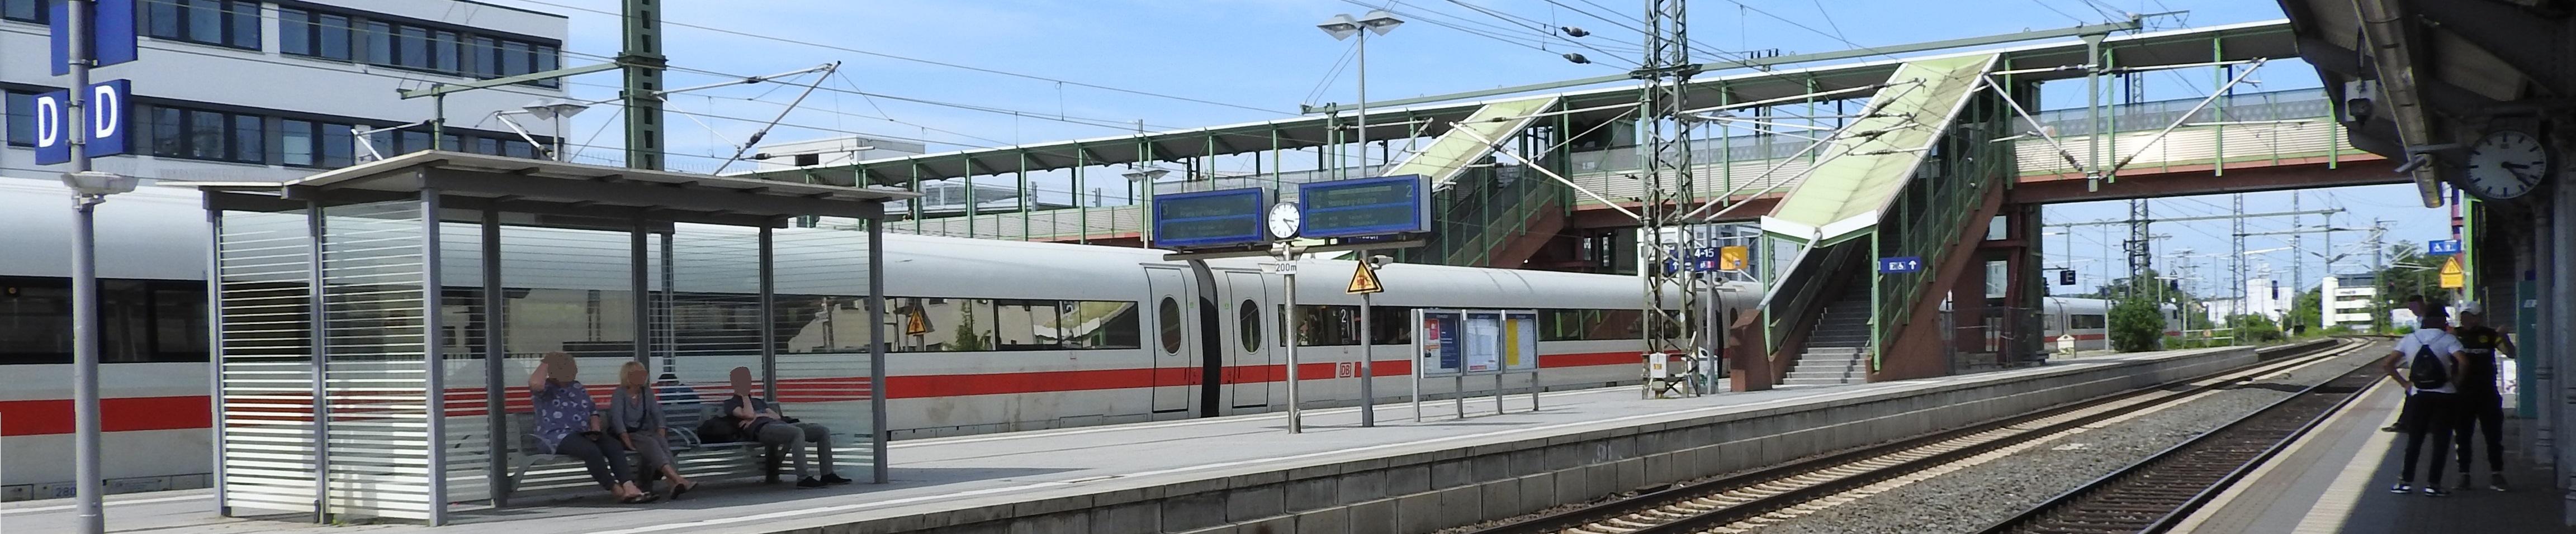 Slider - ICE in Gießen